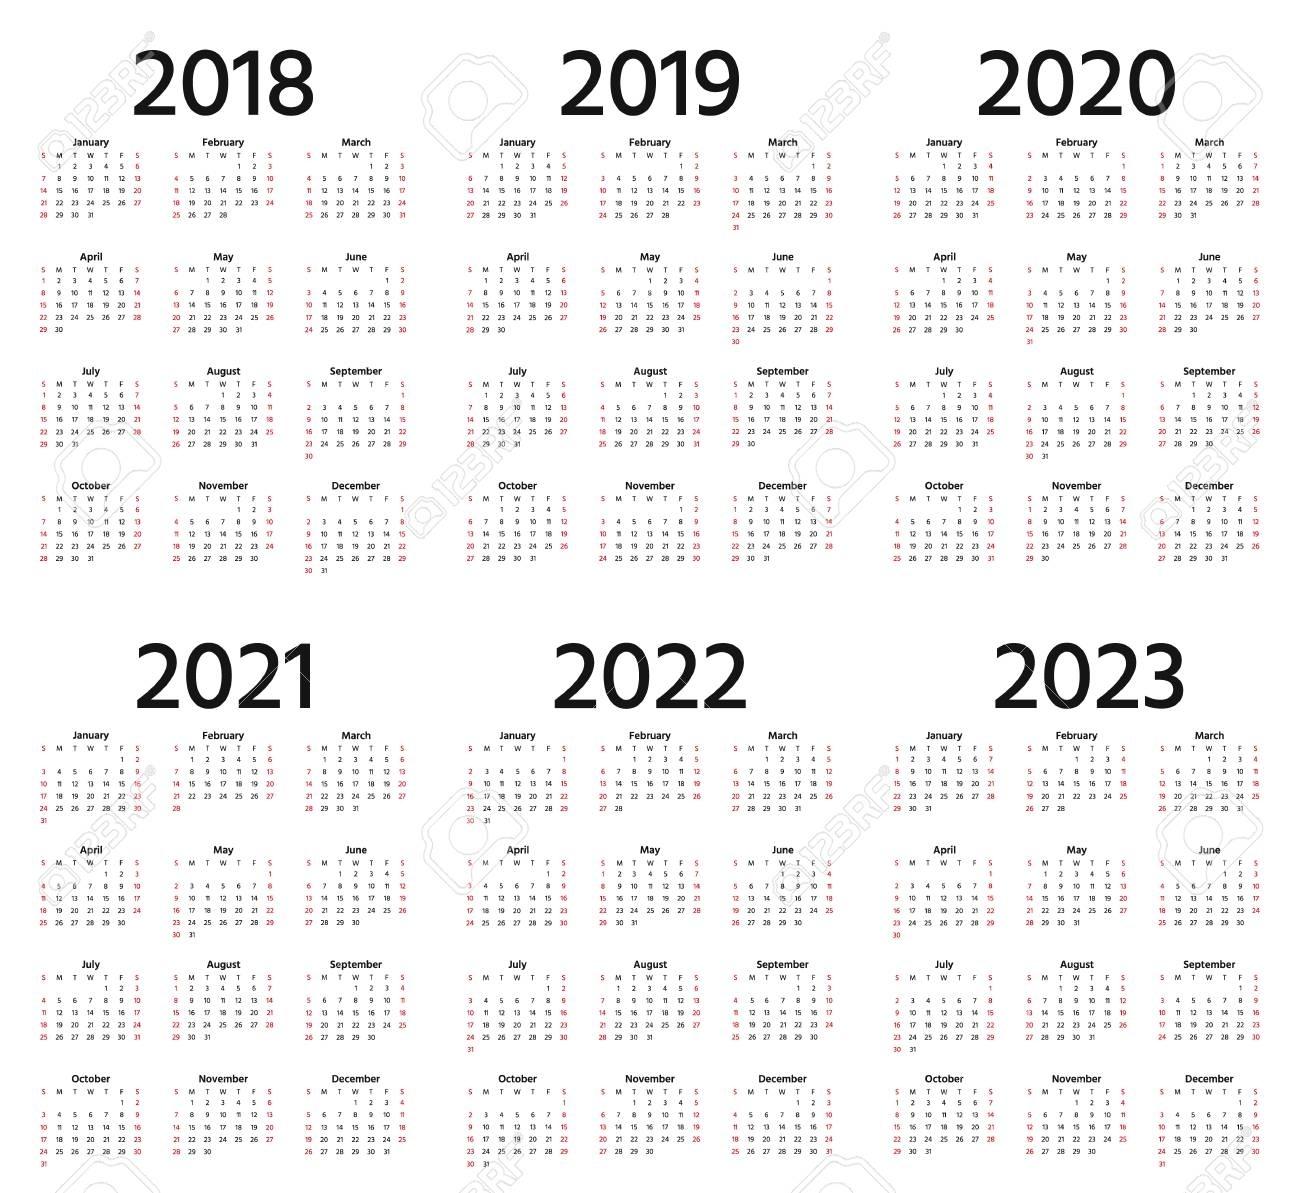 Calendar 2018, 2019, 2020, 2021, 2022, 2023 Year. Week Starts